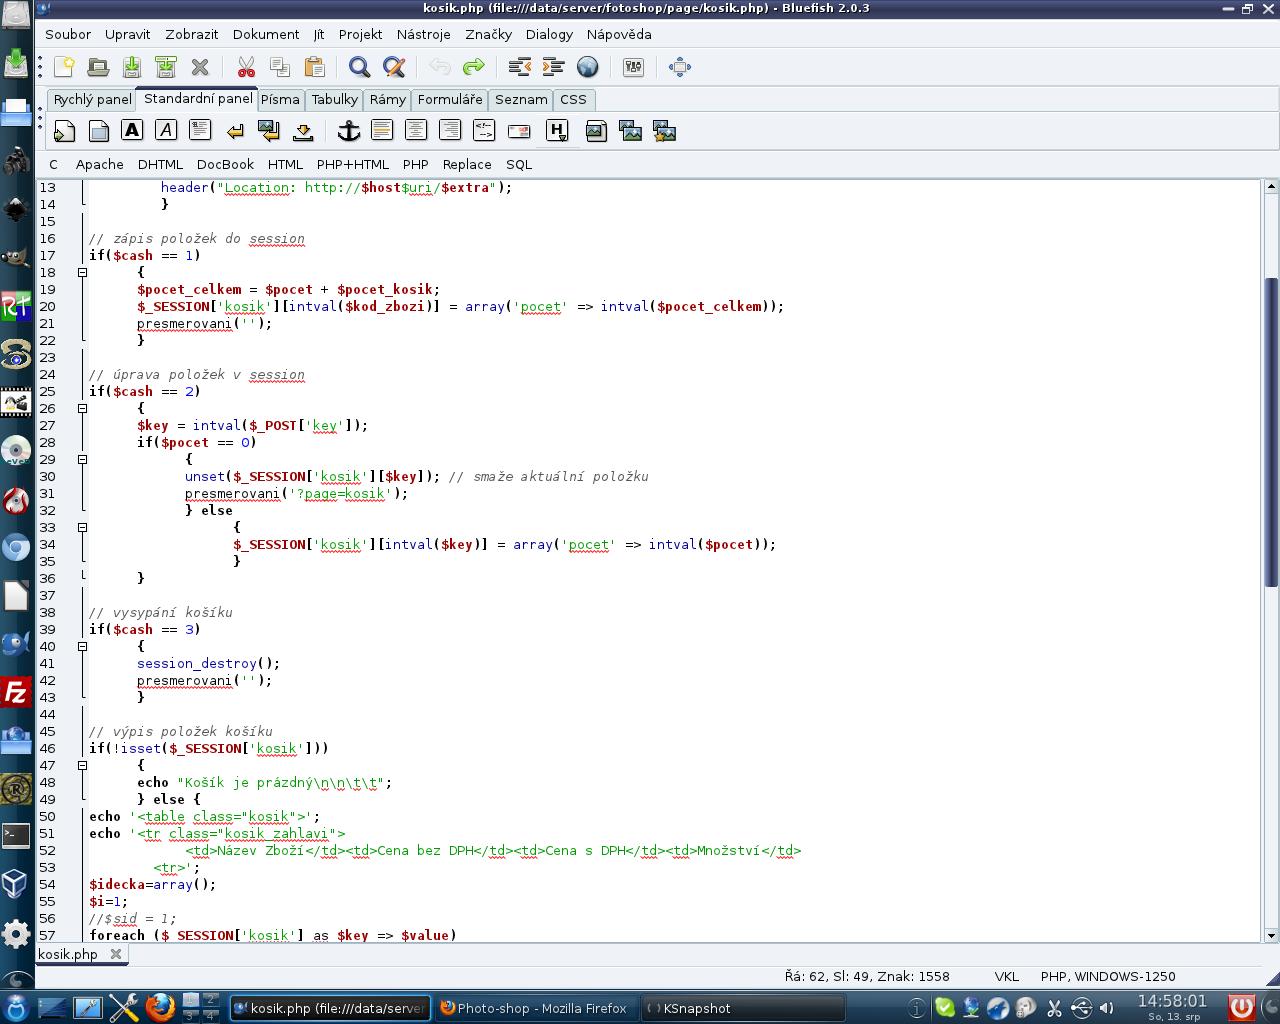 Rellik: Mageia 1, KDE - Bluefish